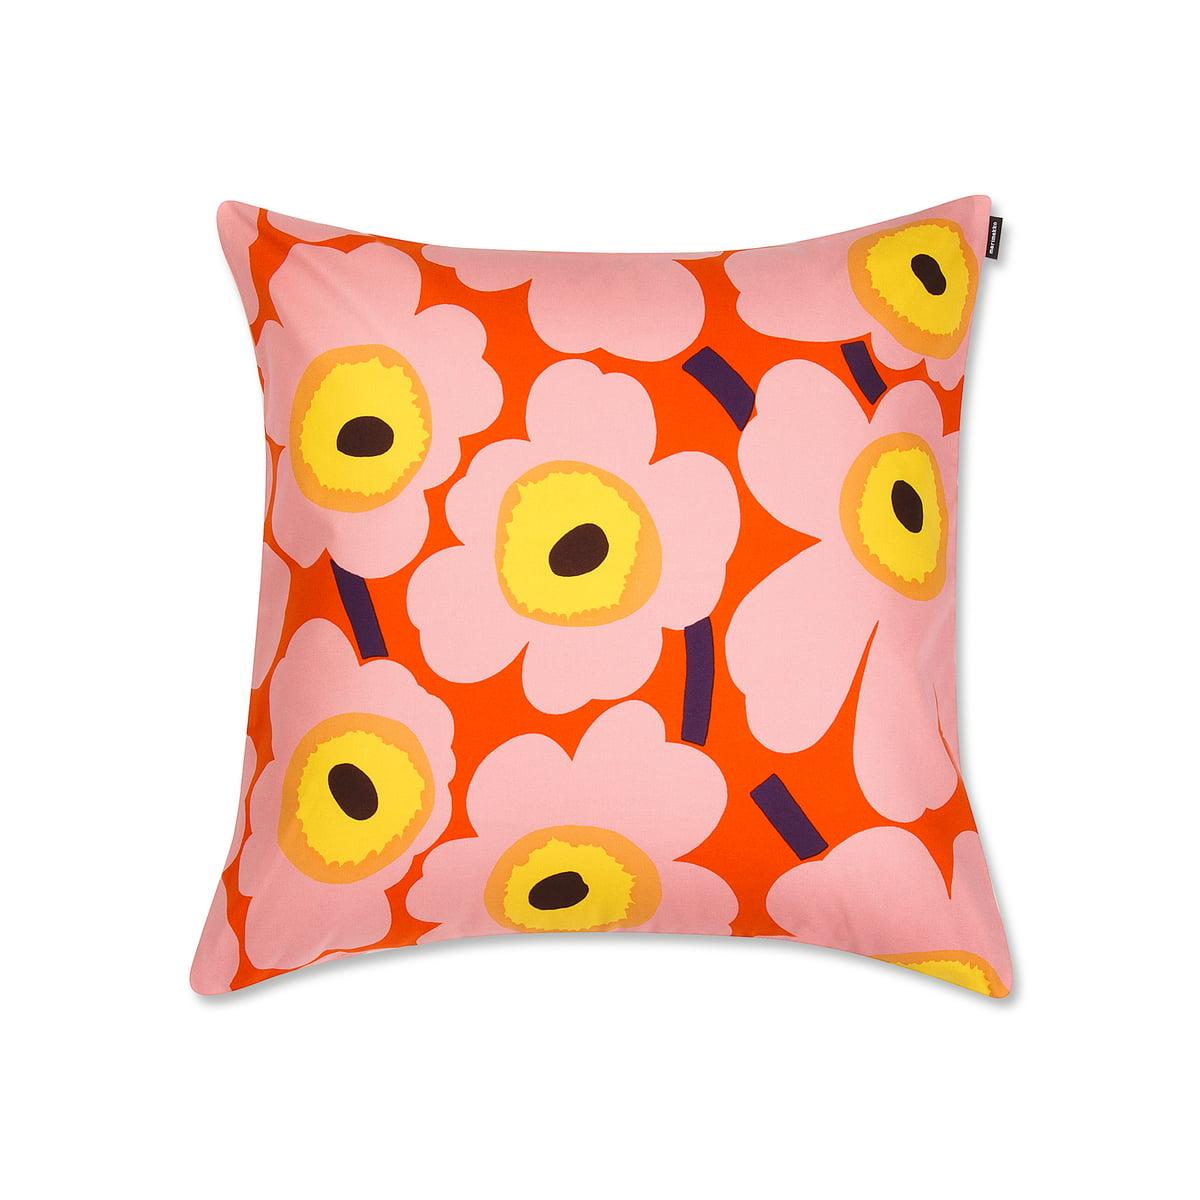 marimekko pieni unikko kissenbezug 50 x 50 cm orange rosa gelb fr hling 2018 mehrfarbig. Black Bedroom Furniture Sets. Home Design Ideas